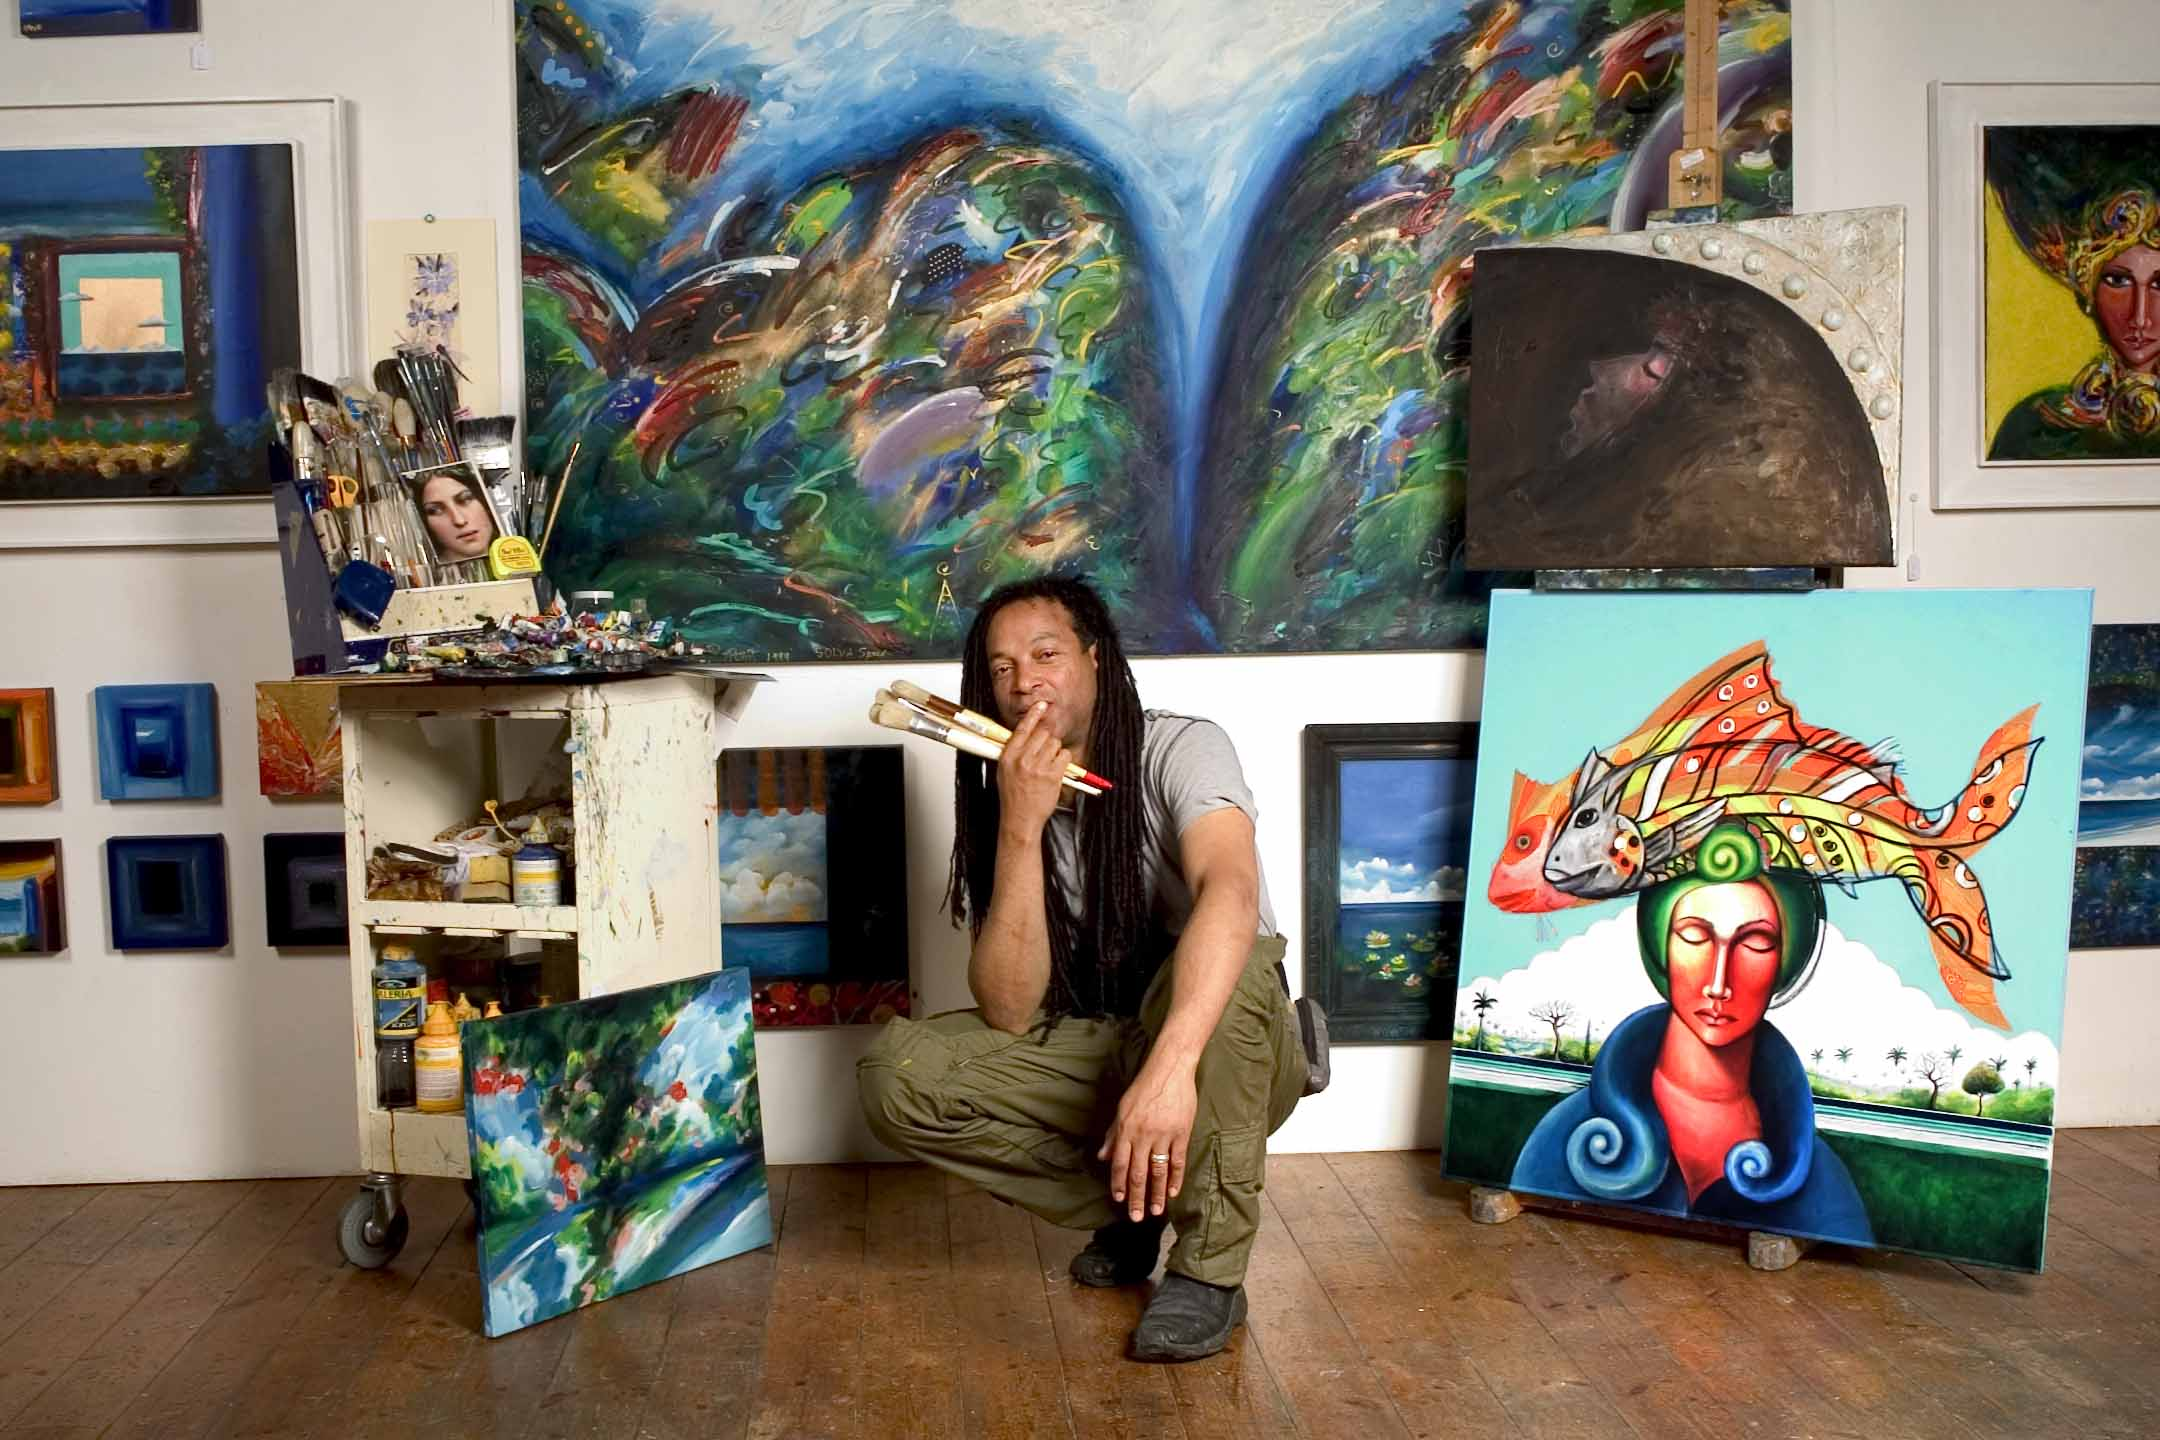 Raul Speek Gallery